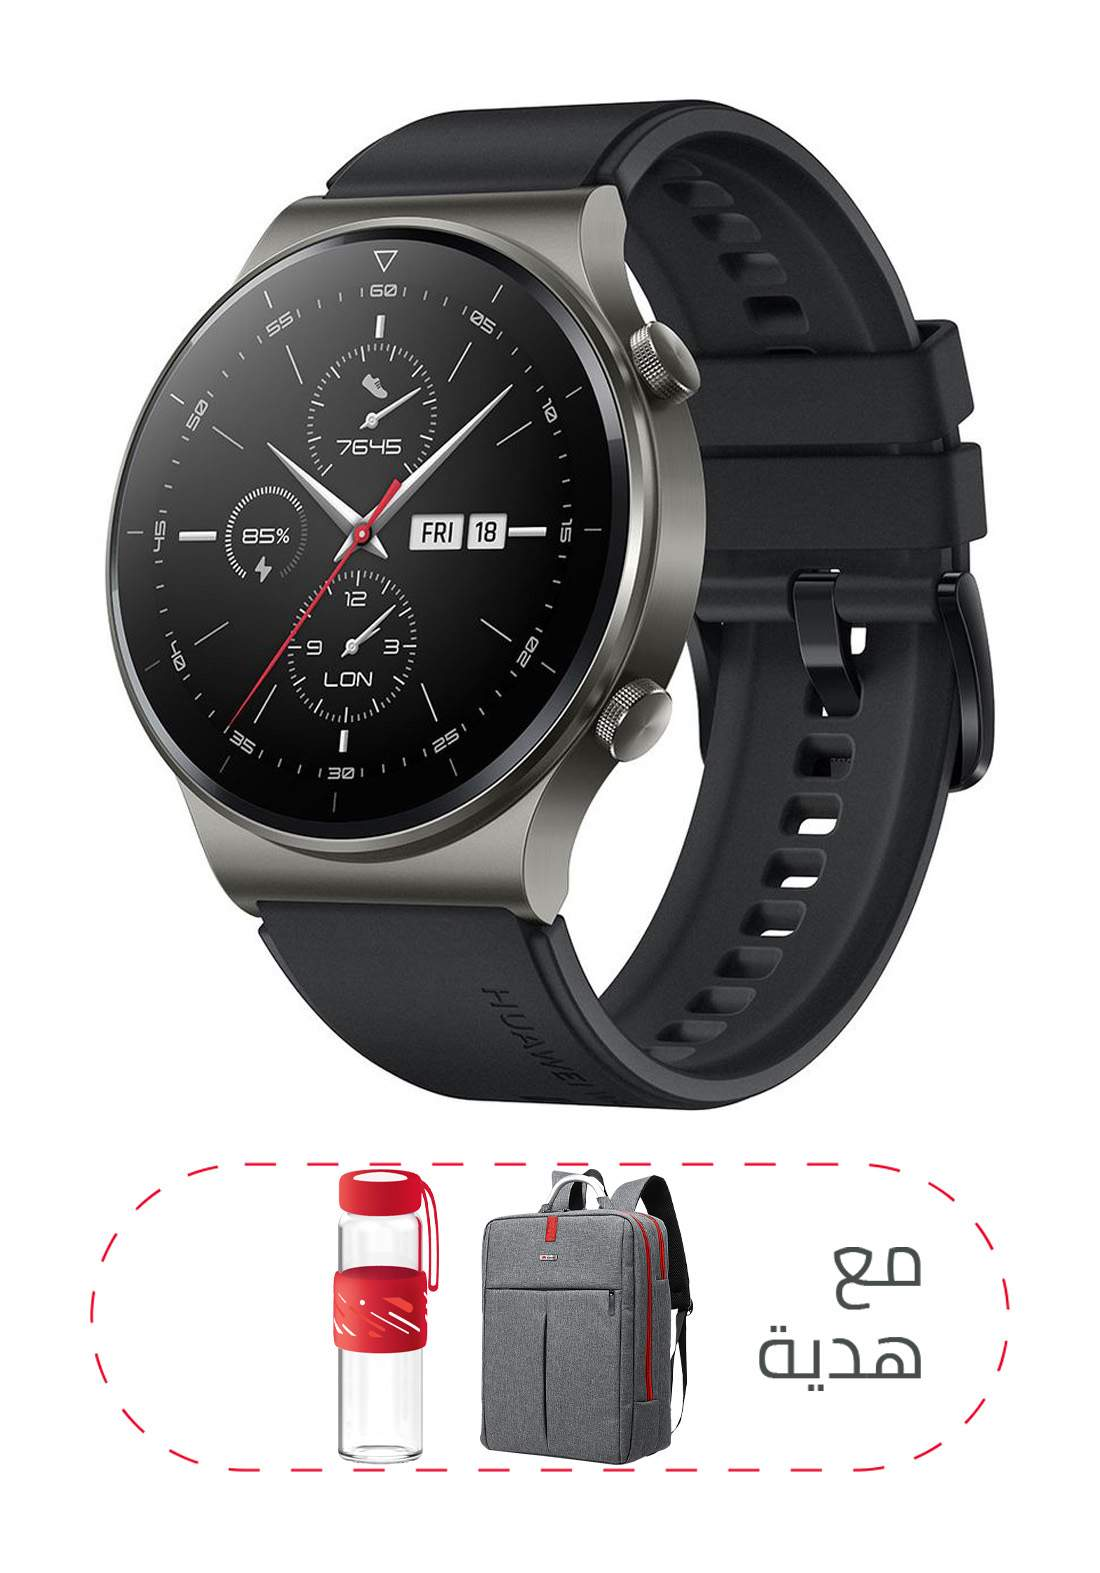 Huawei GT 2 Pro Bluetooth Smart Watch - Black ساعة ذكية